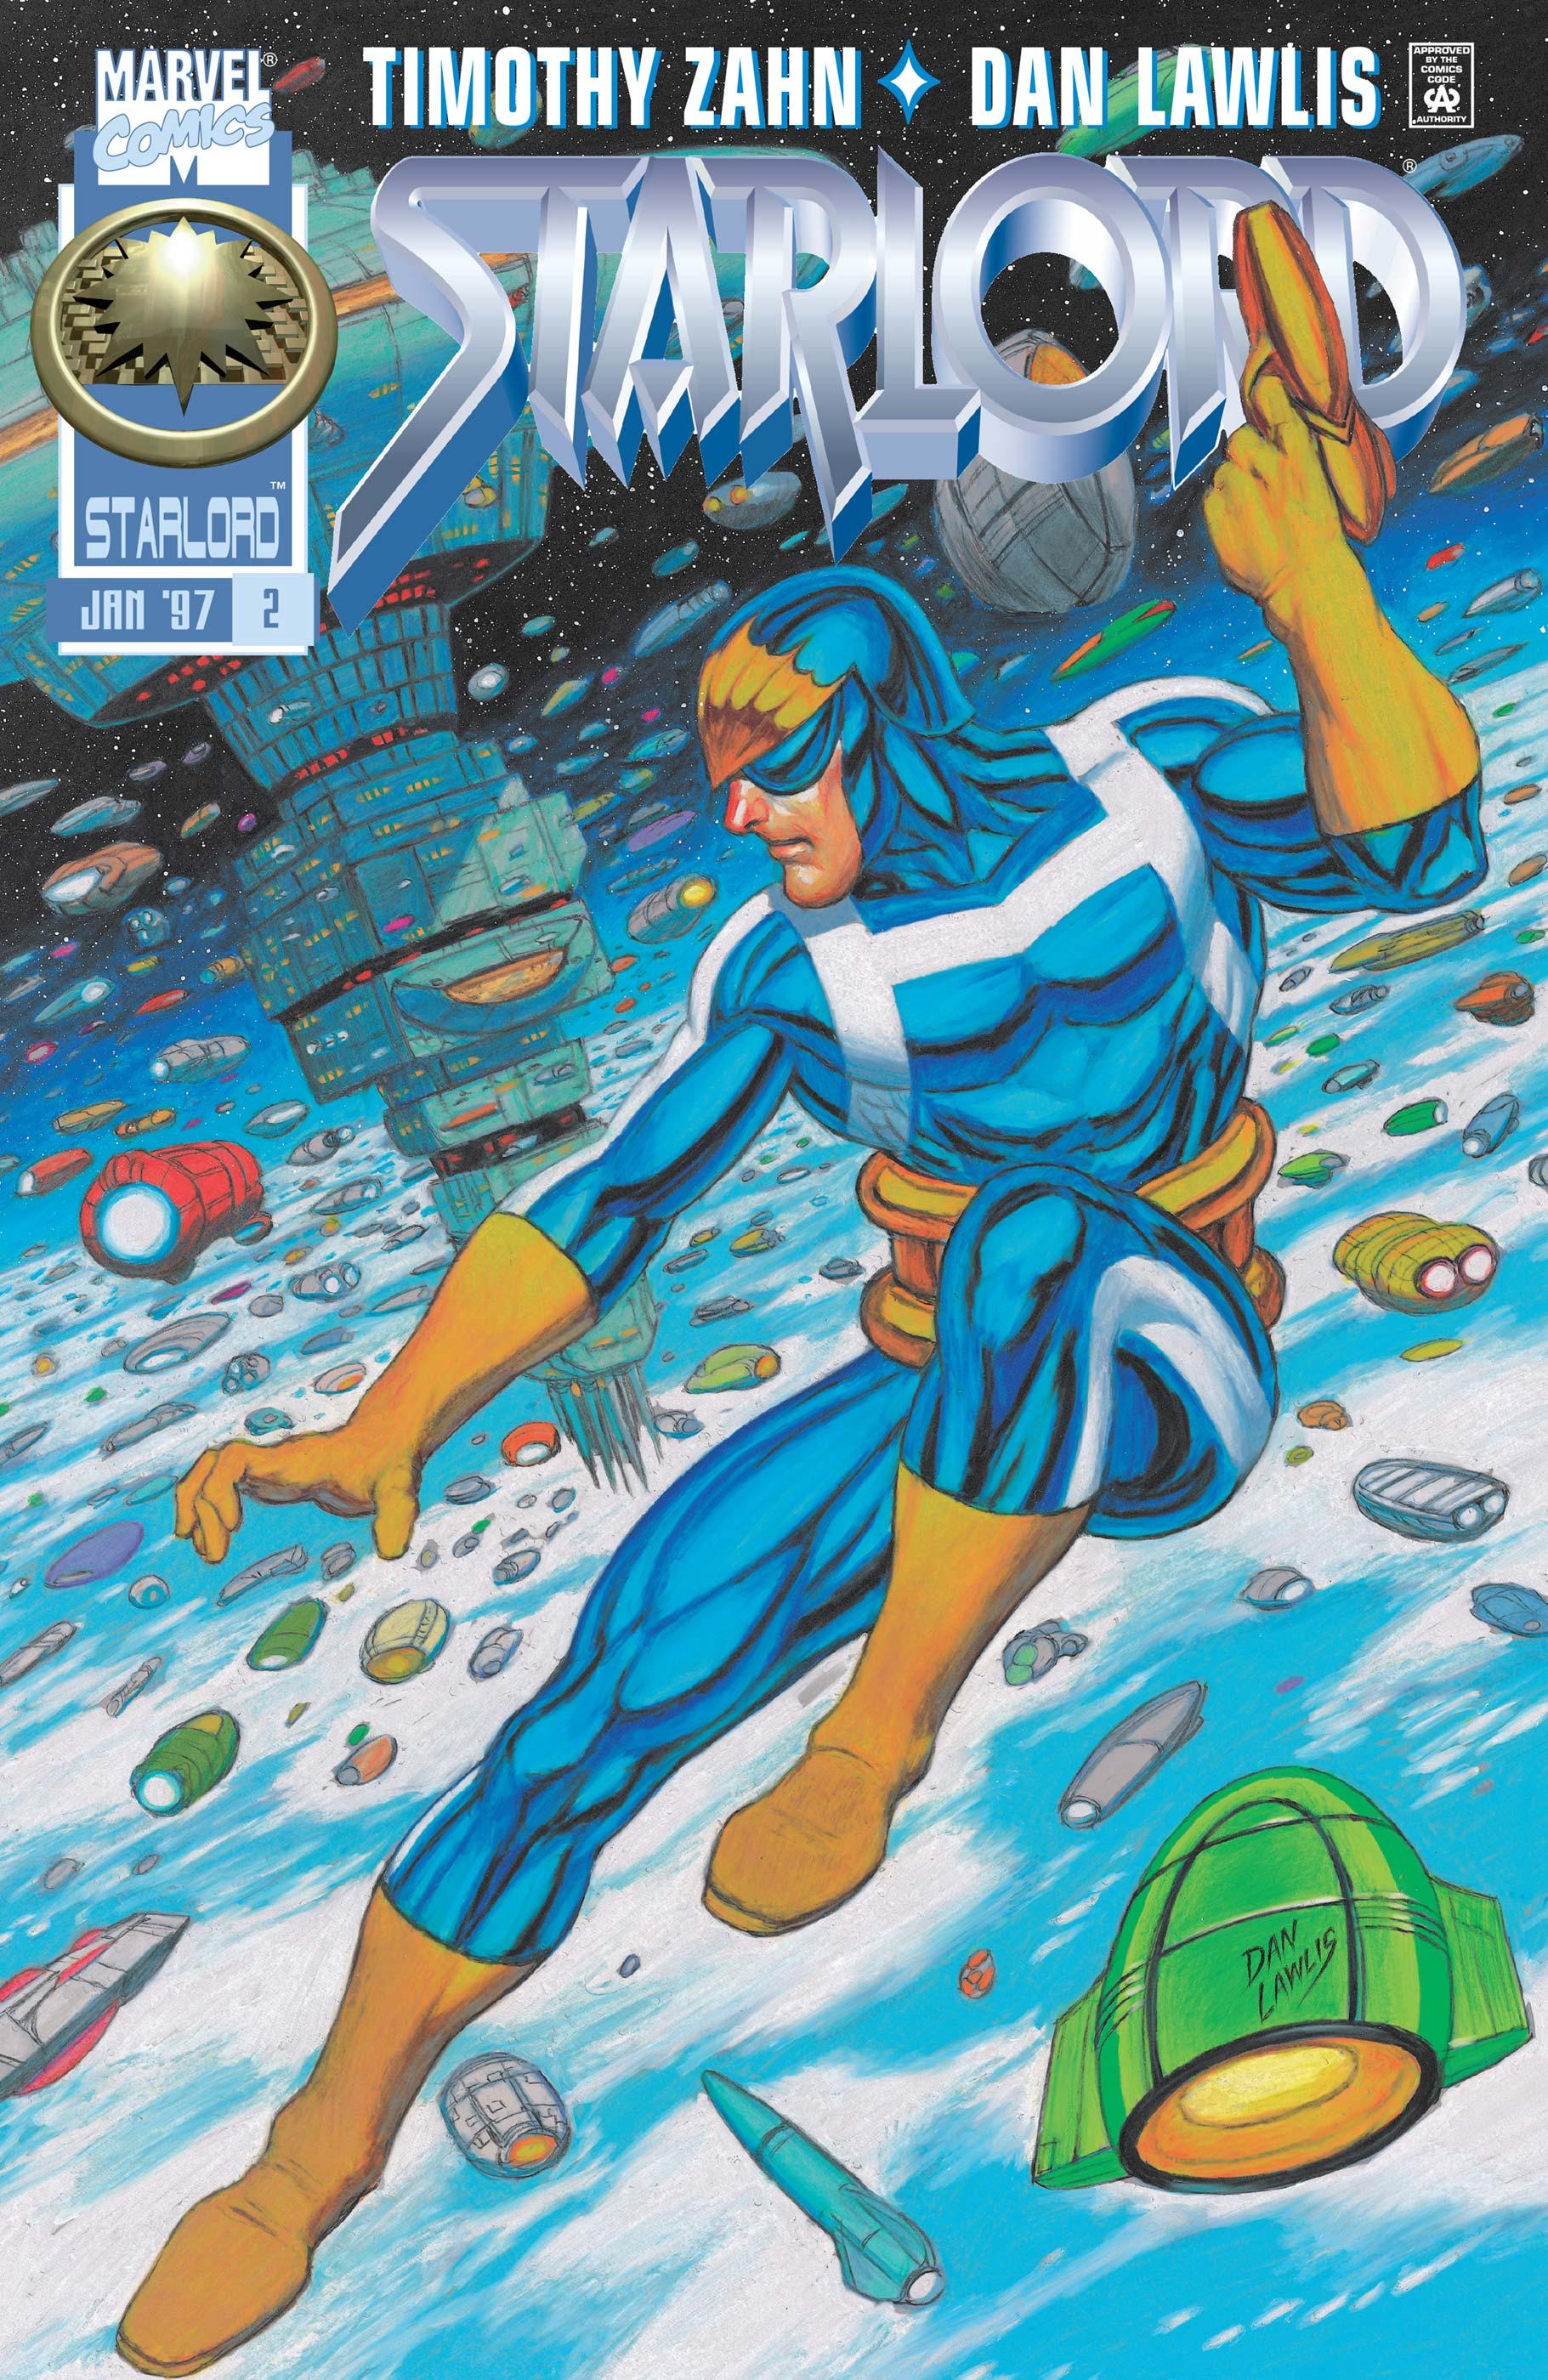 Starlord (1996) #2